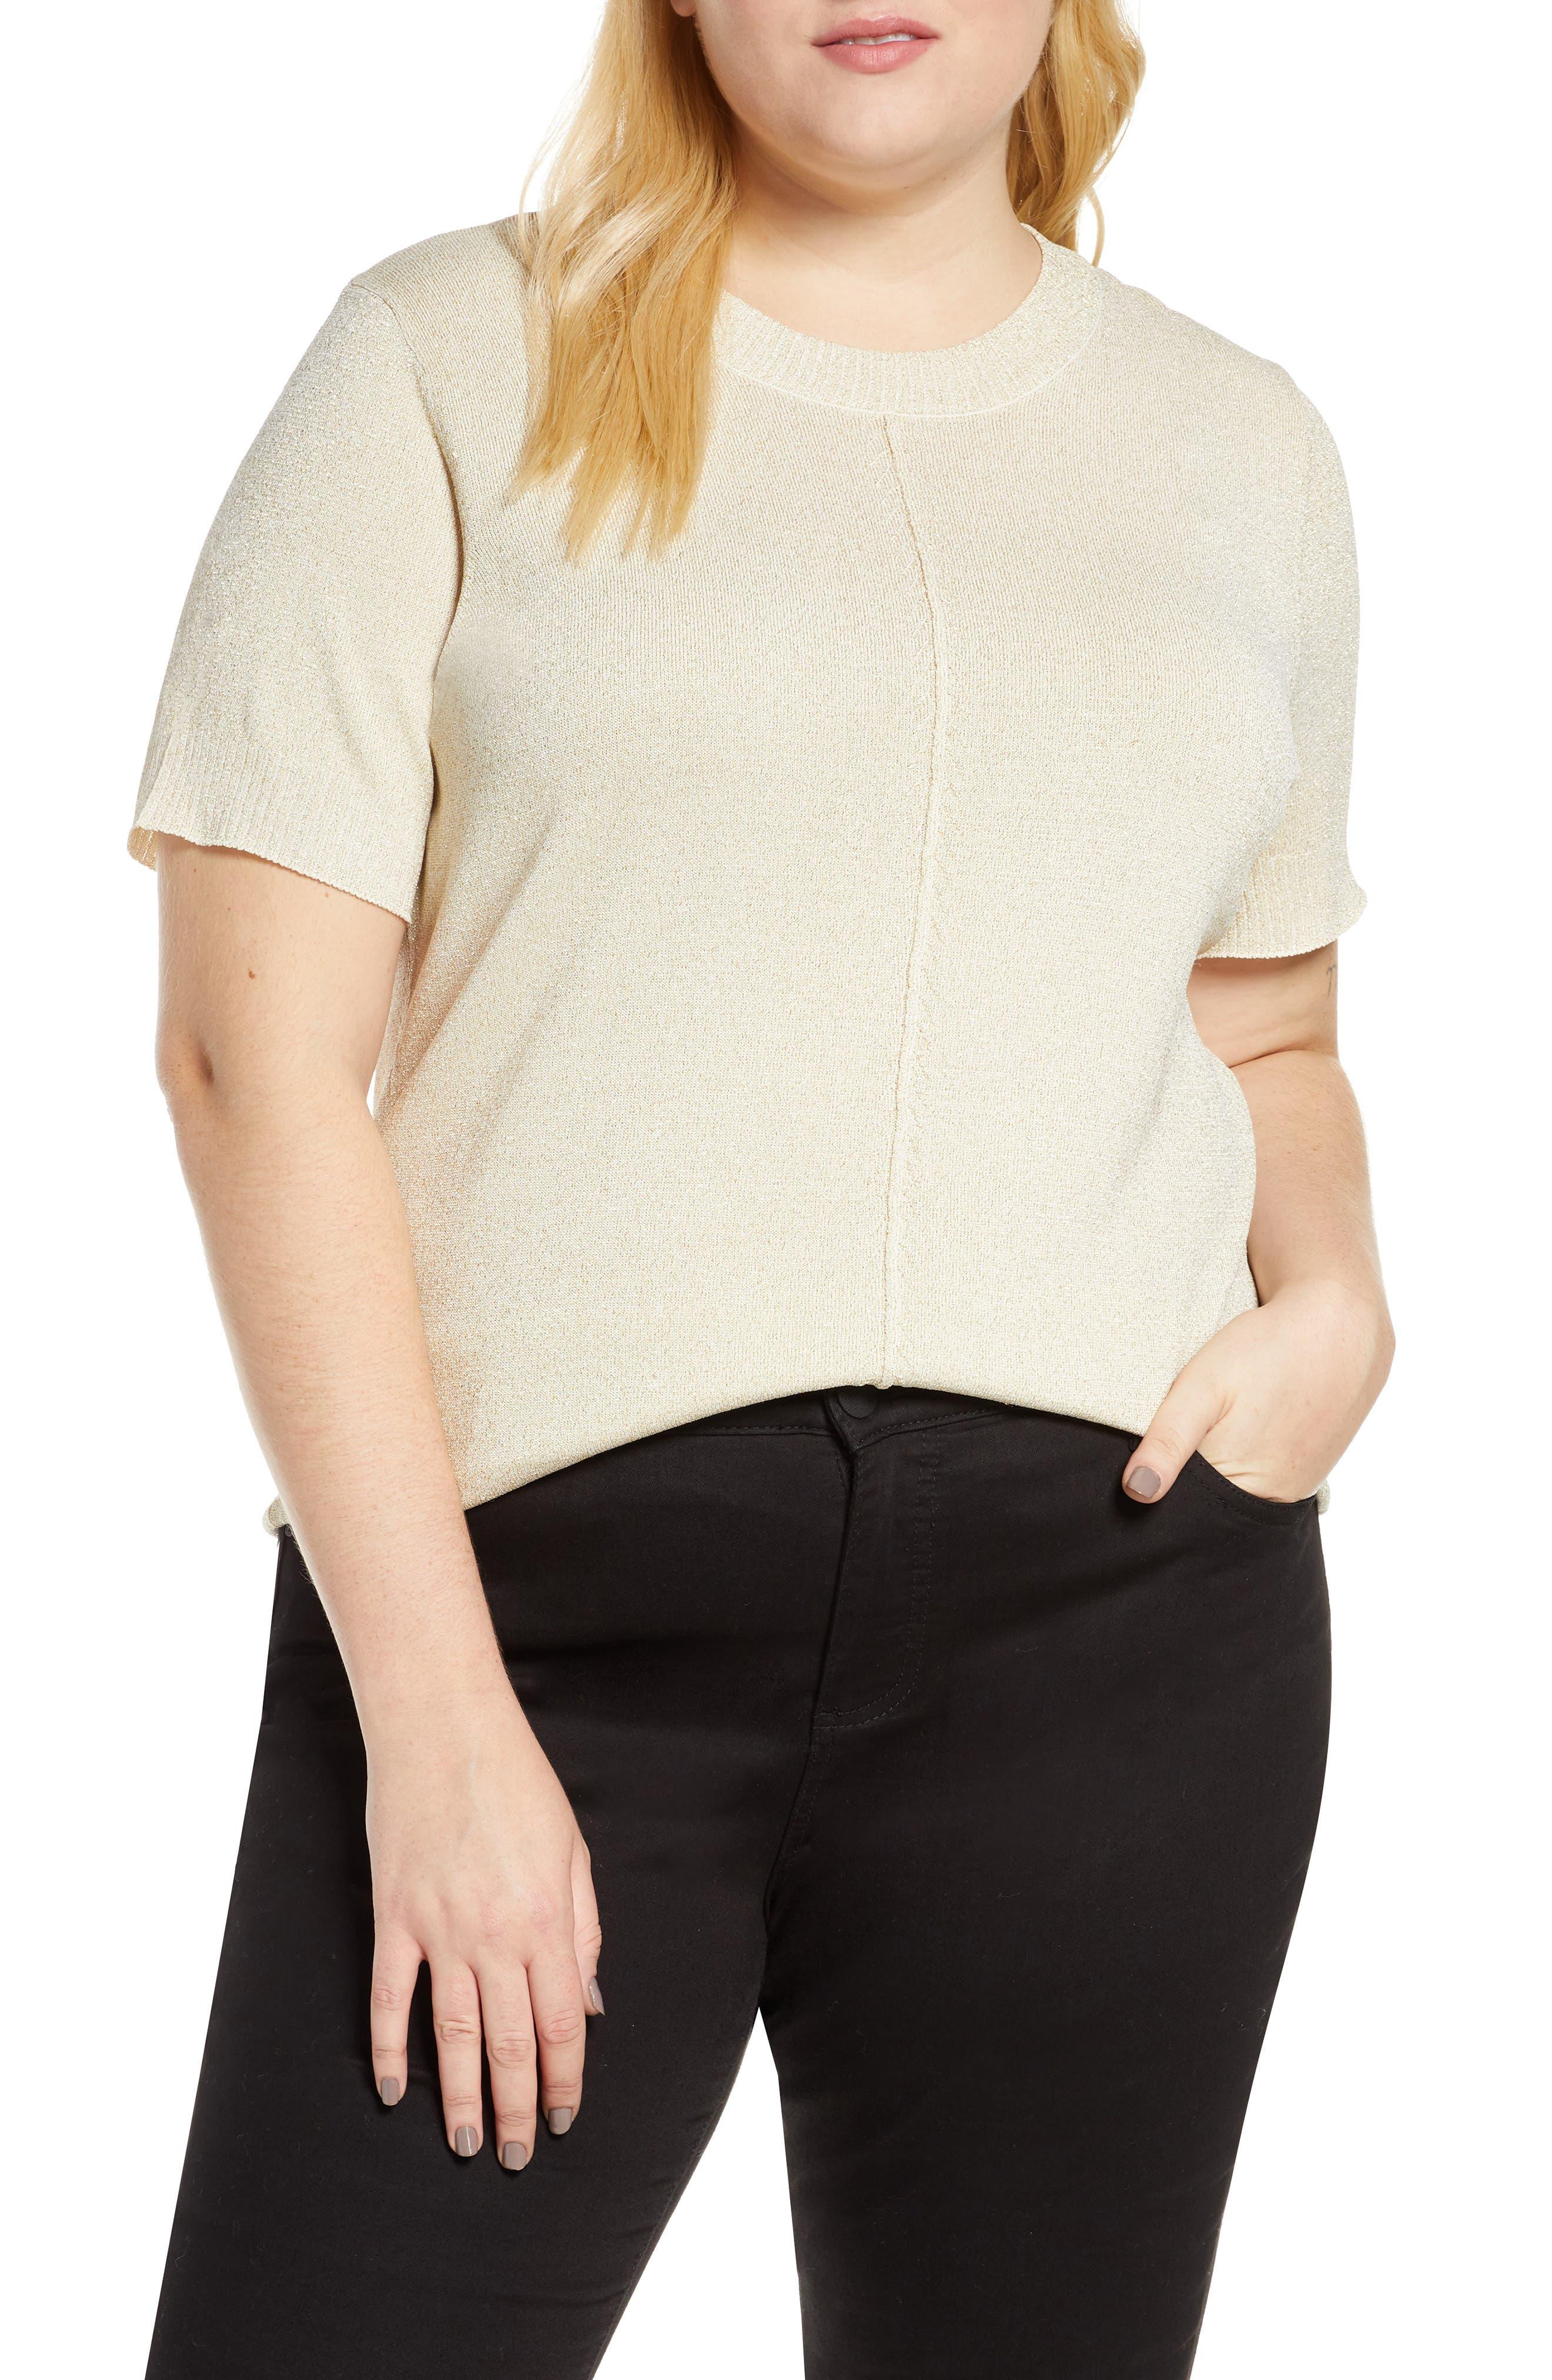 Image of Rachel Roy Metallic Knit Short Sleeve Top